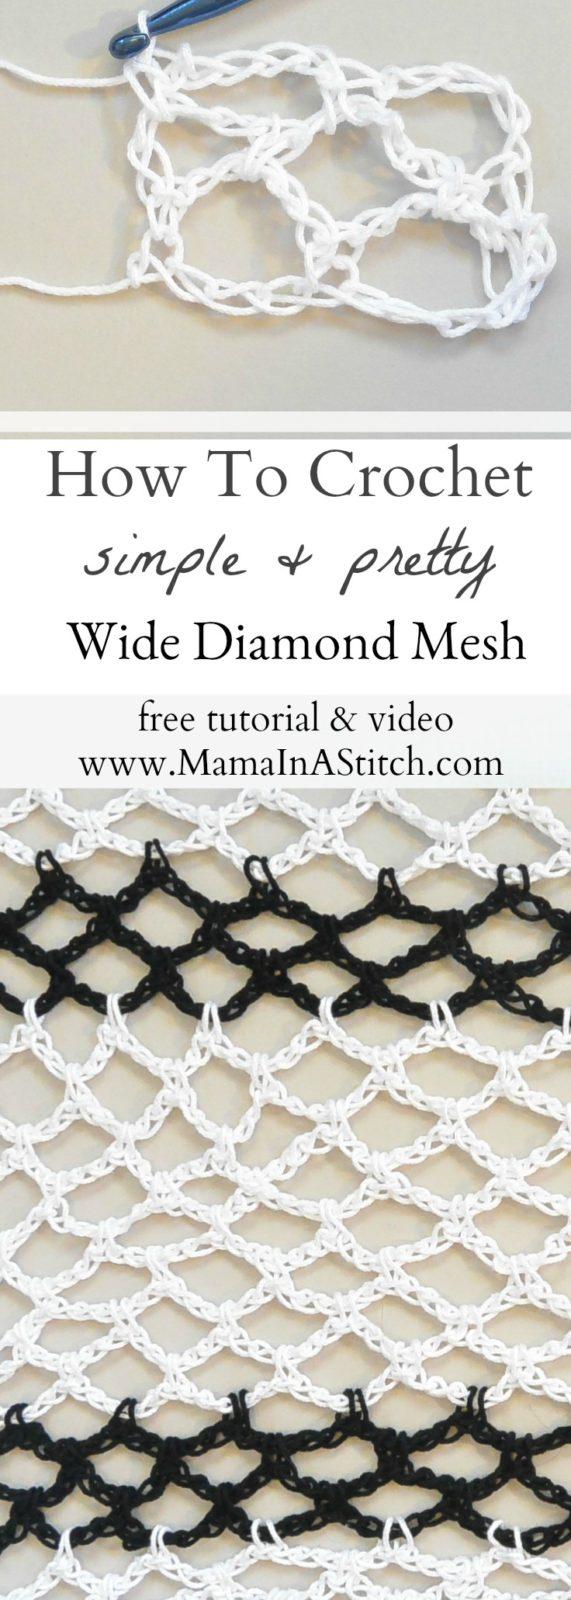 How To Crochet Diamond Mesh Stitch – Mama In A Stitch